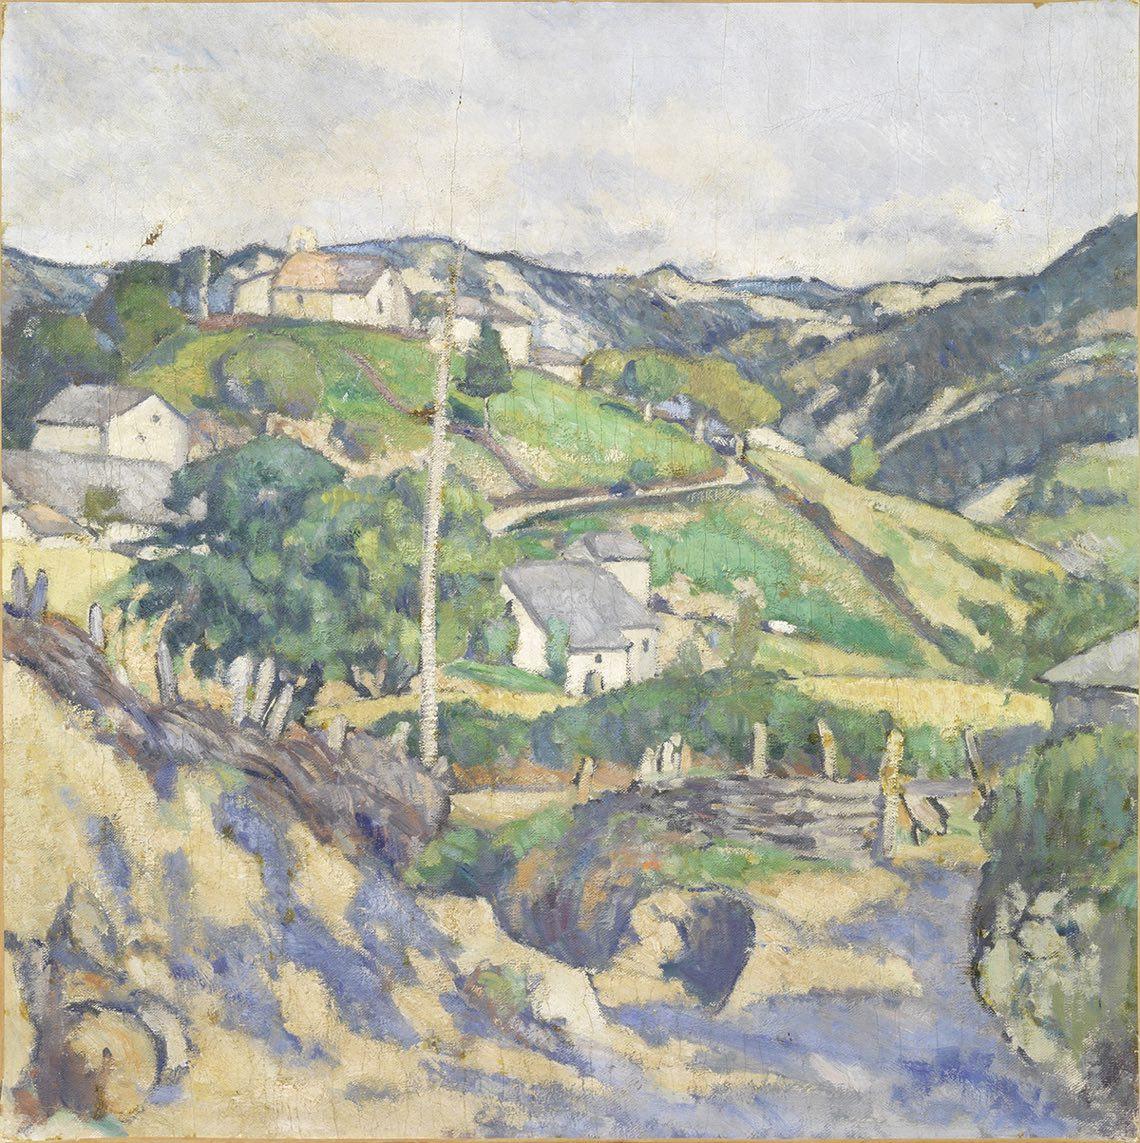 Soffici Ardengo_Bulciano_1909_olio su tela_70 X 70 cm alta